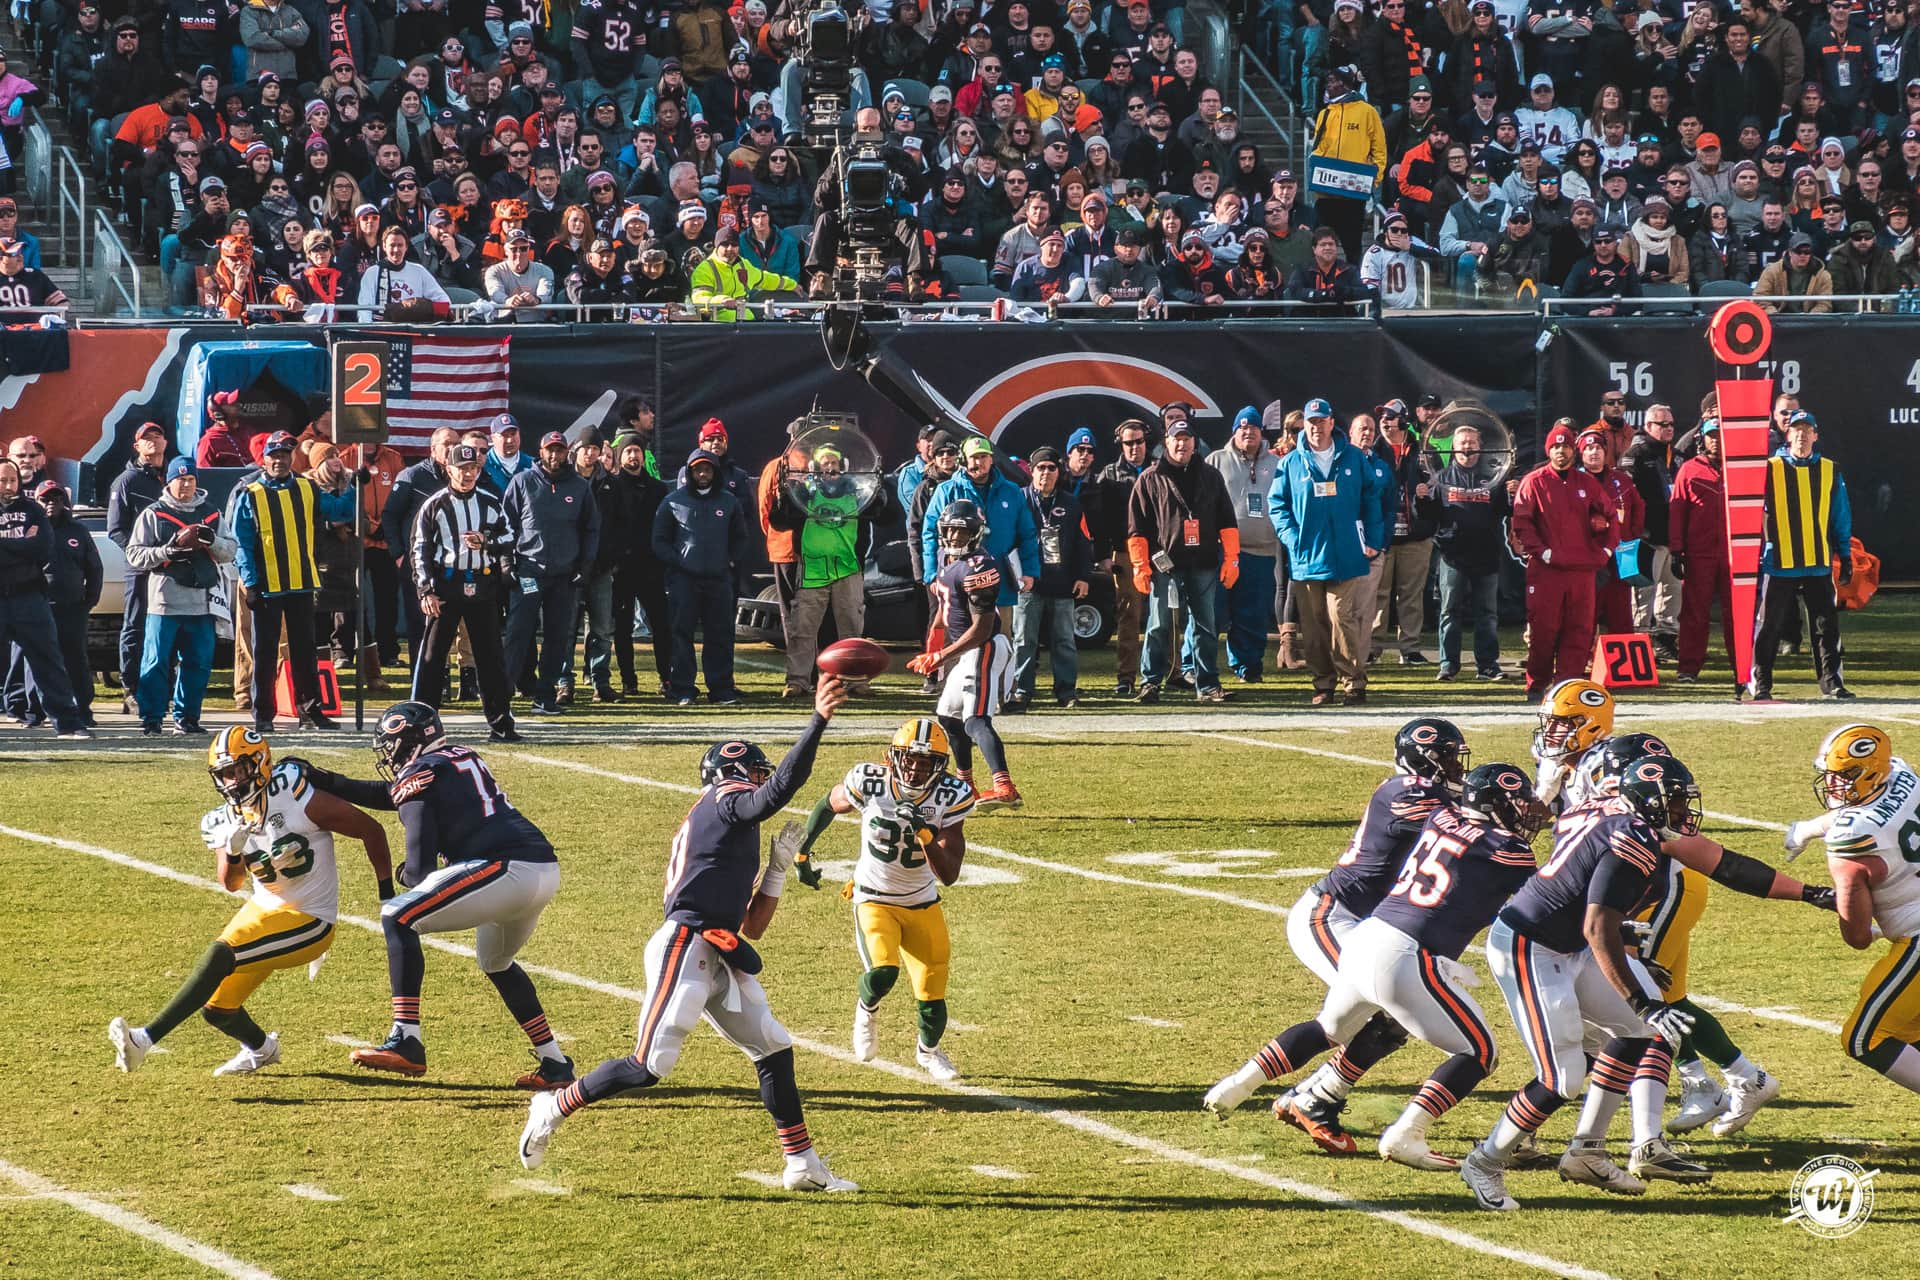 Chicago Bears vs Green Bay Packers 12/16/2018